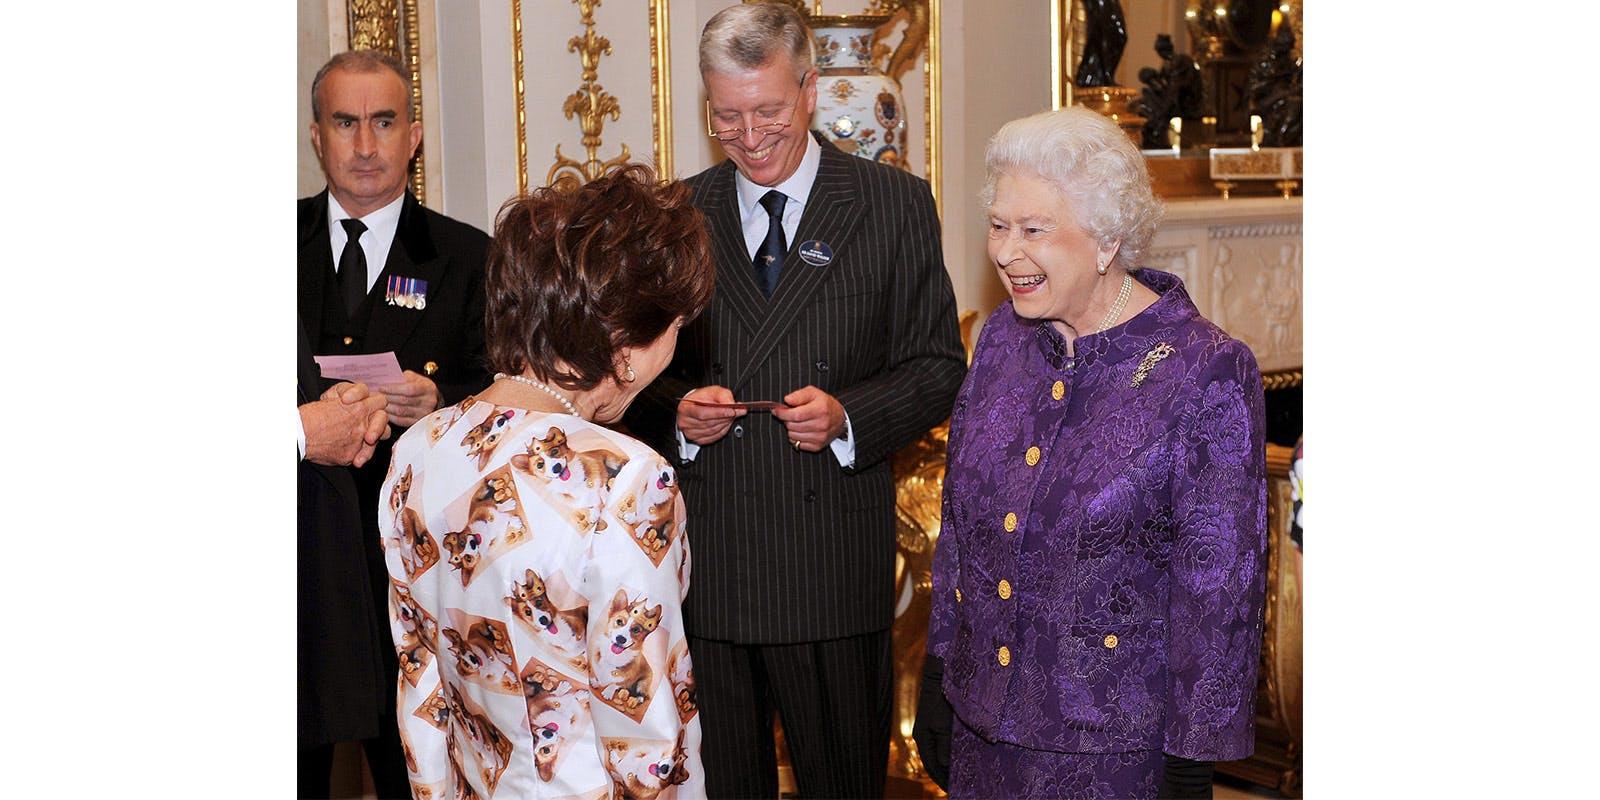 Kathy Lette meets the Queen